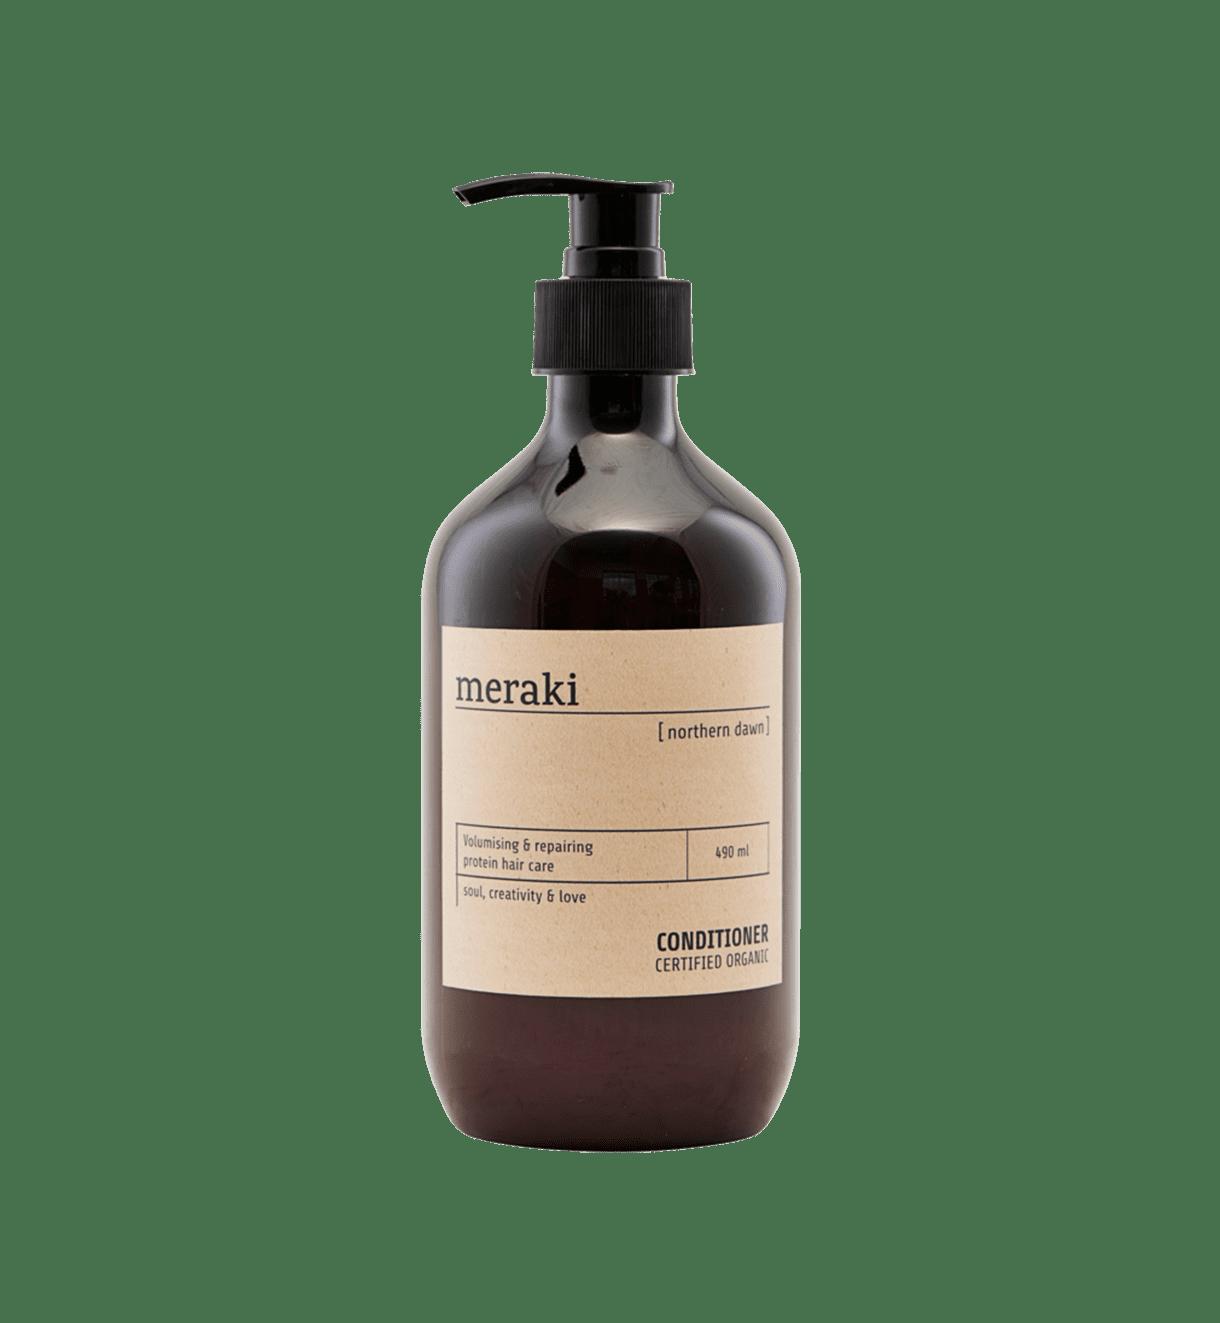 Meraki - Northern Dawn Volume Balsam 490 ml (Mkas210/309770210)